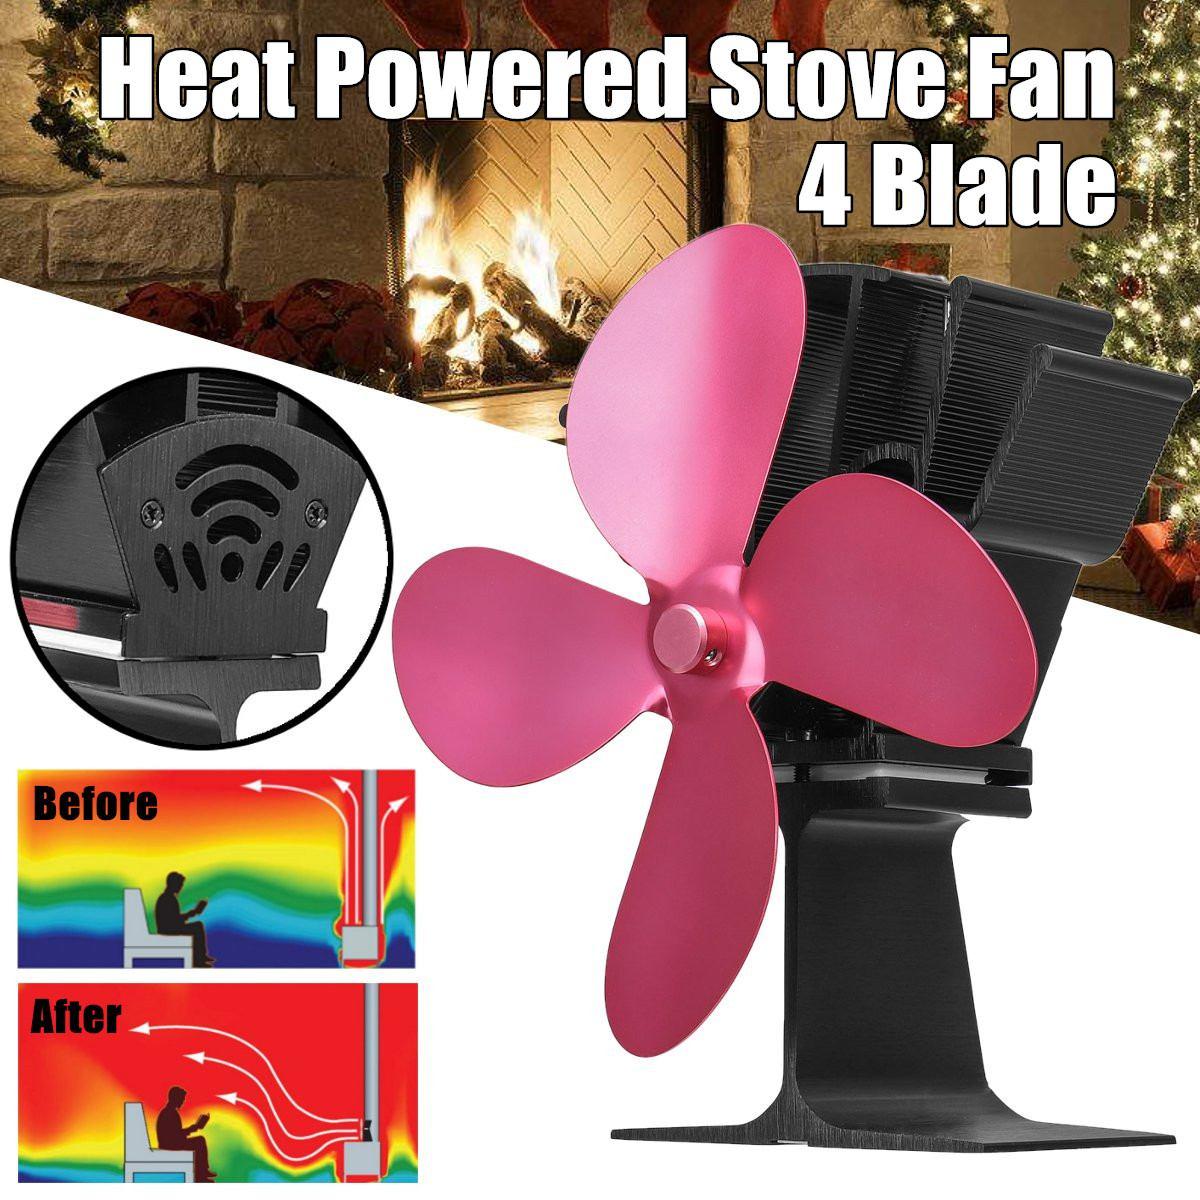 4 Blades Heat Powered Stove Fan Log Wood Burner Ecological fan Quiet Home Fireplace Fan Efficient Heat Distribution